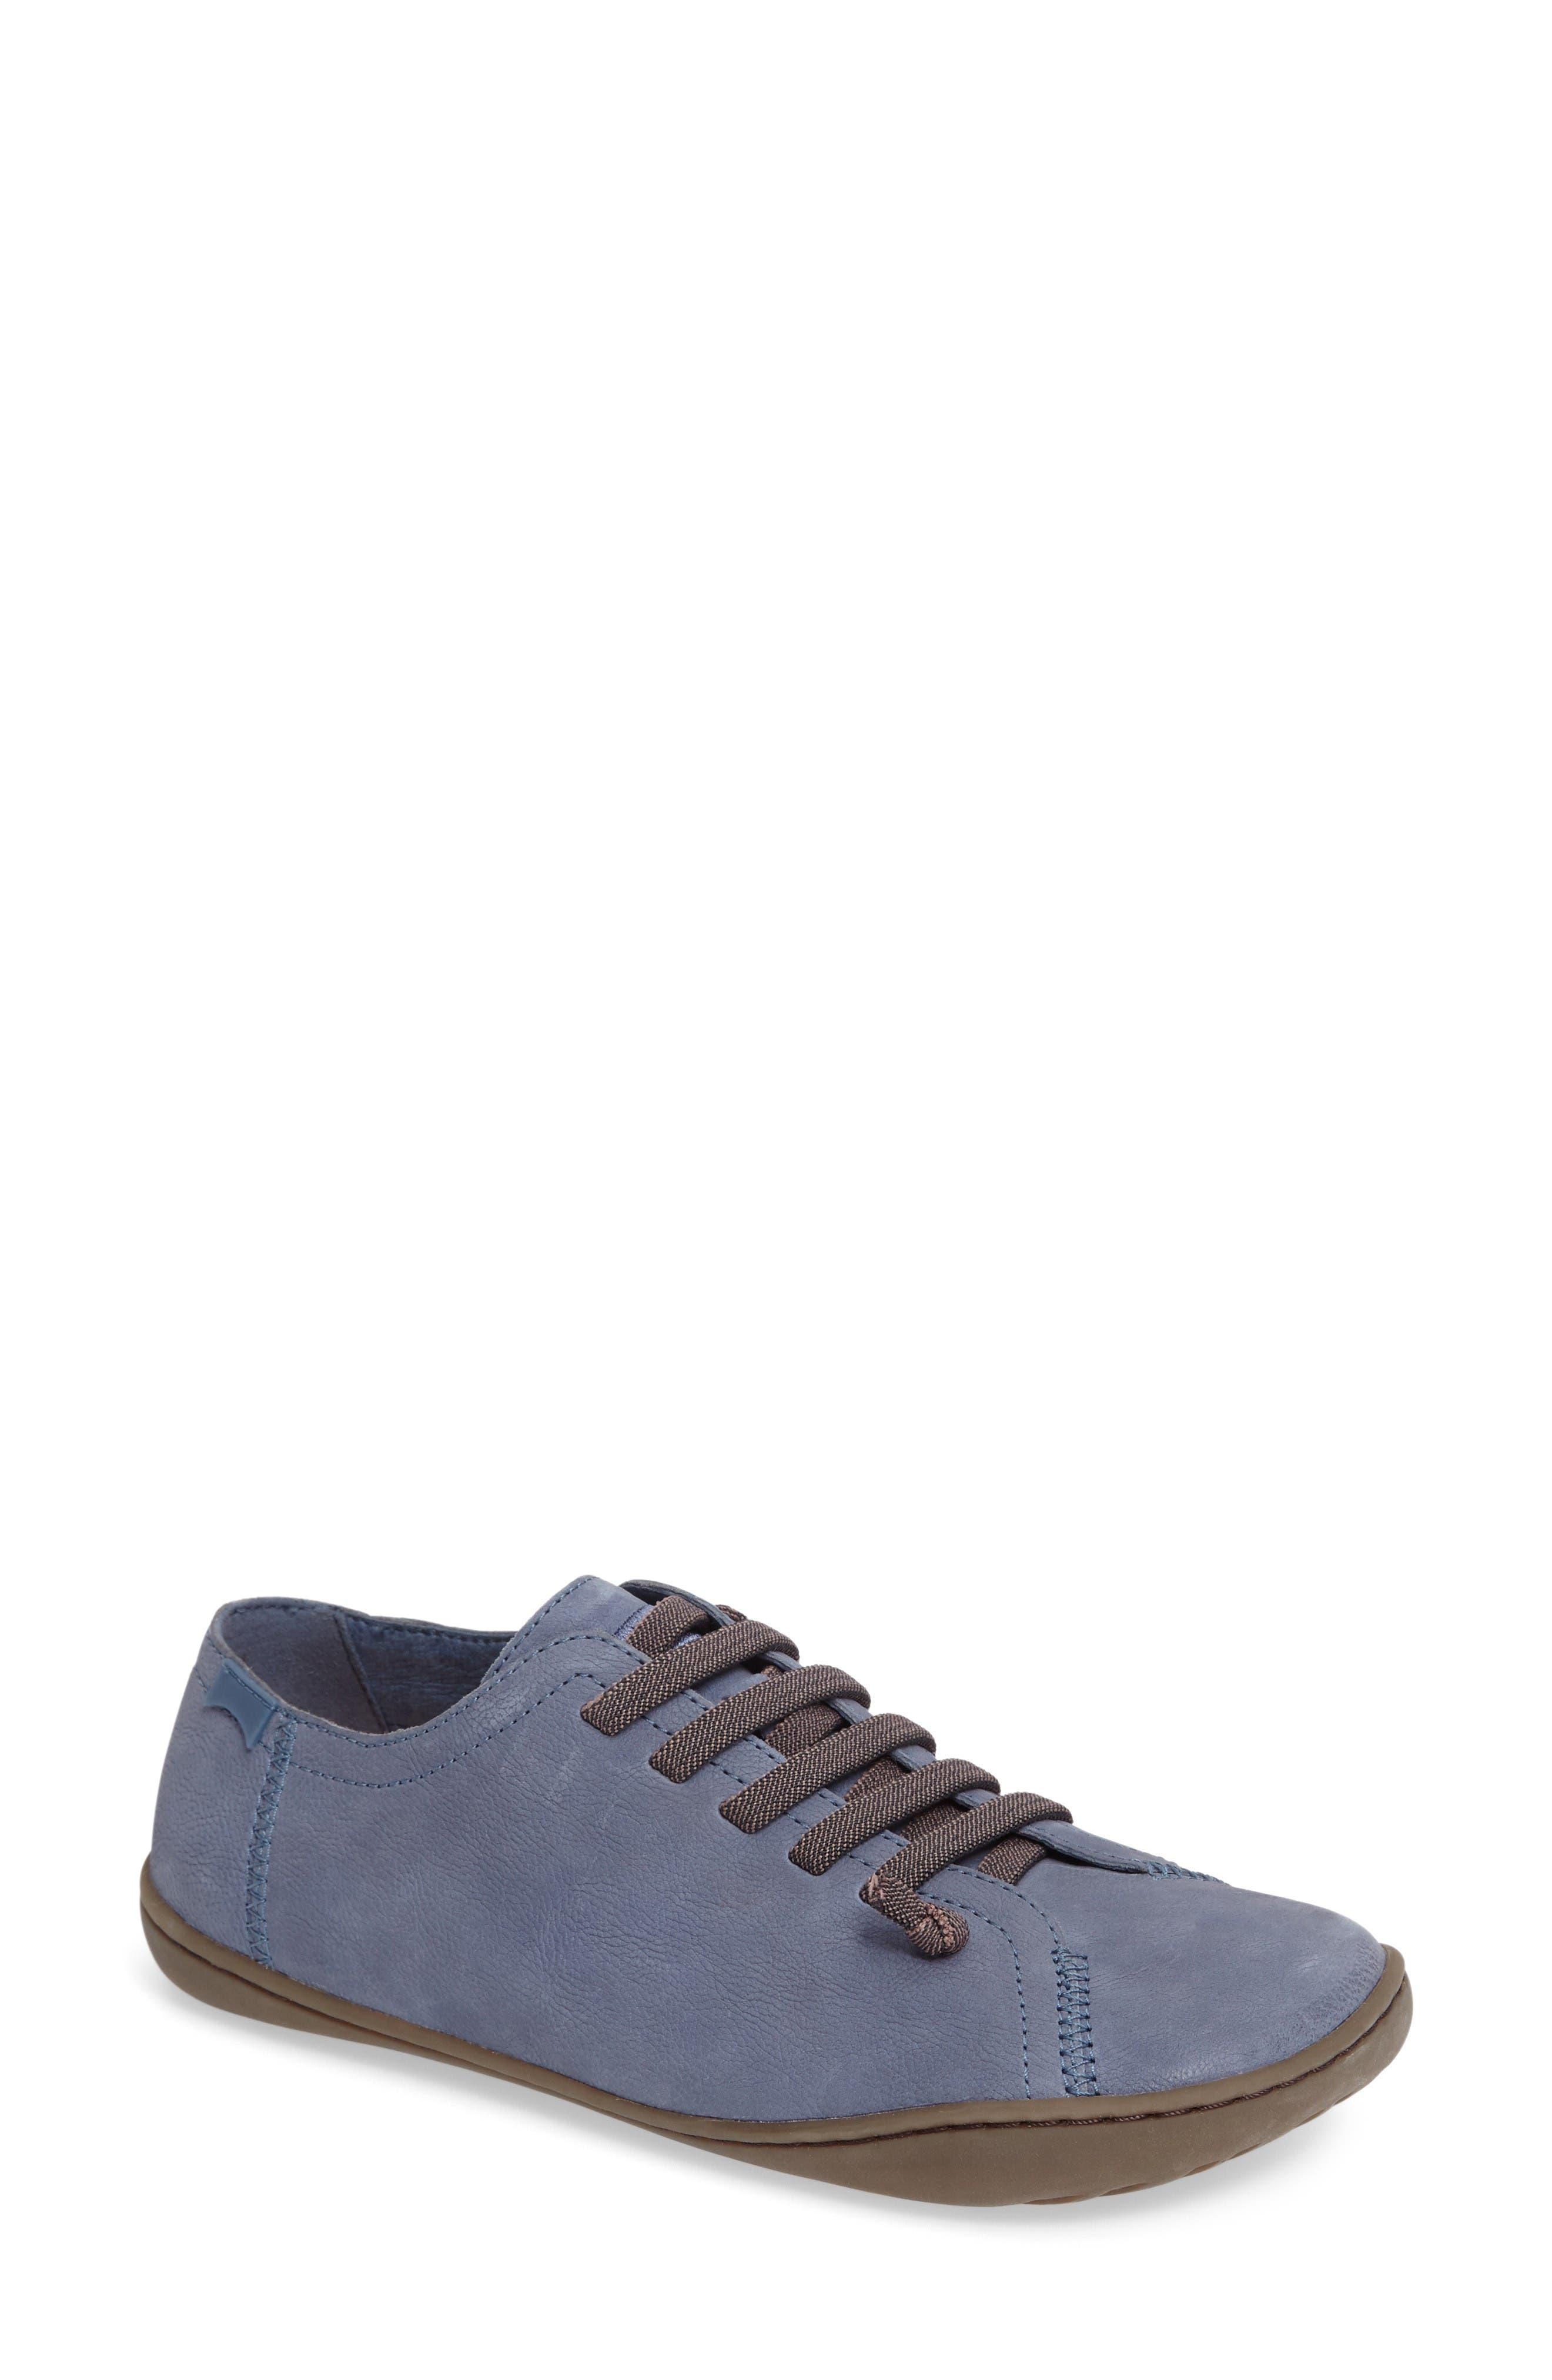 Alternate Image 1 Selected - Camper 'Peu Cami' Leather Sneaker (Women)